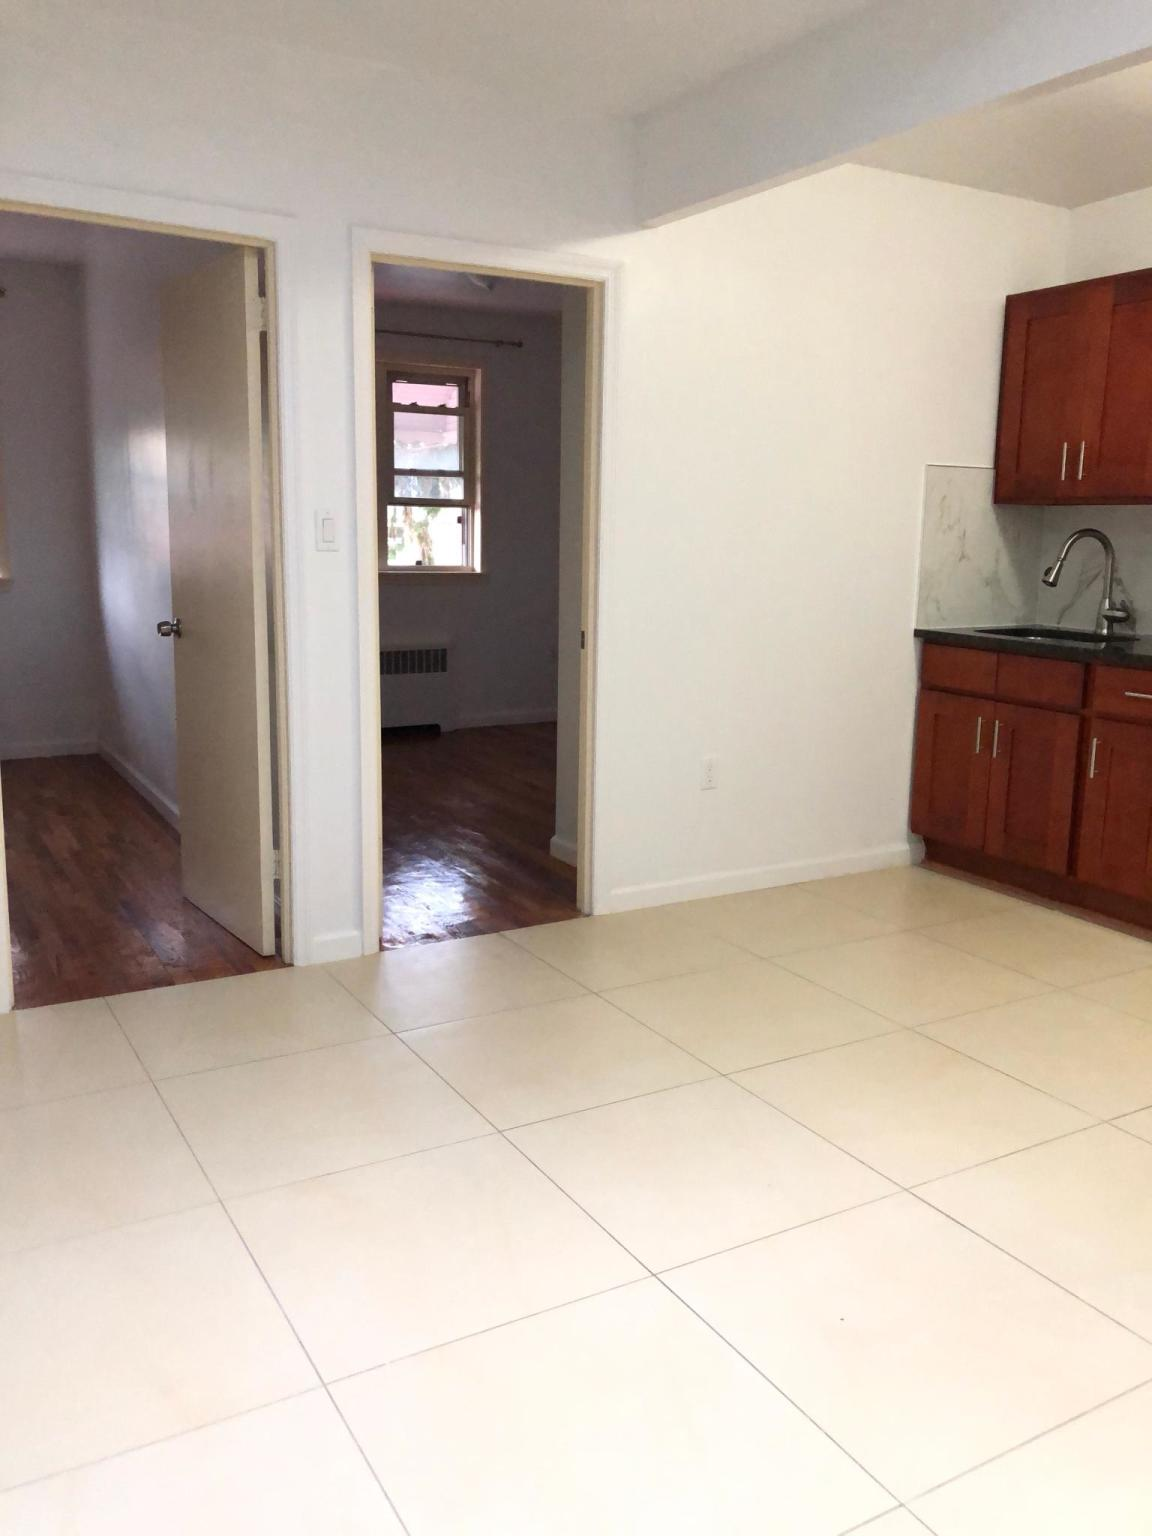 14830 58th Rd #2, Flushing, NY 11355 - 3 Bed, 1 Bath - 7